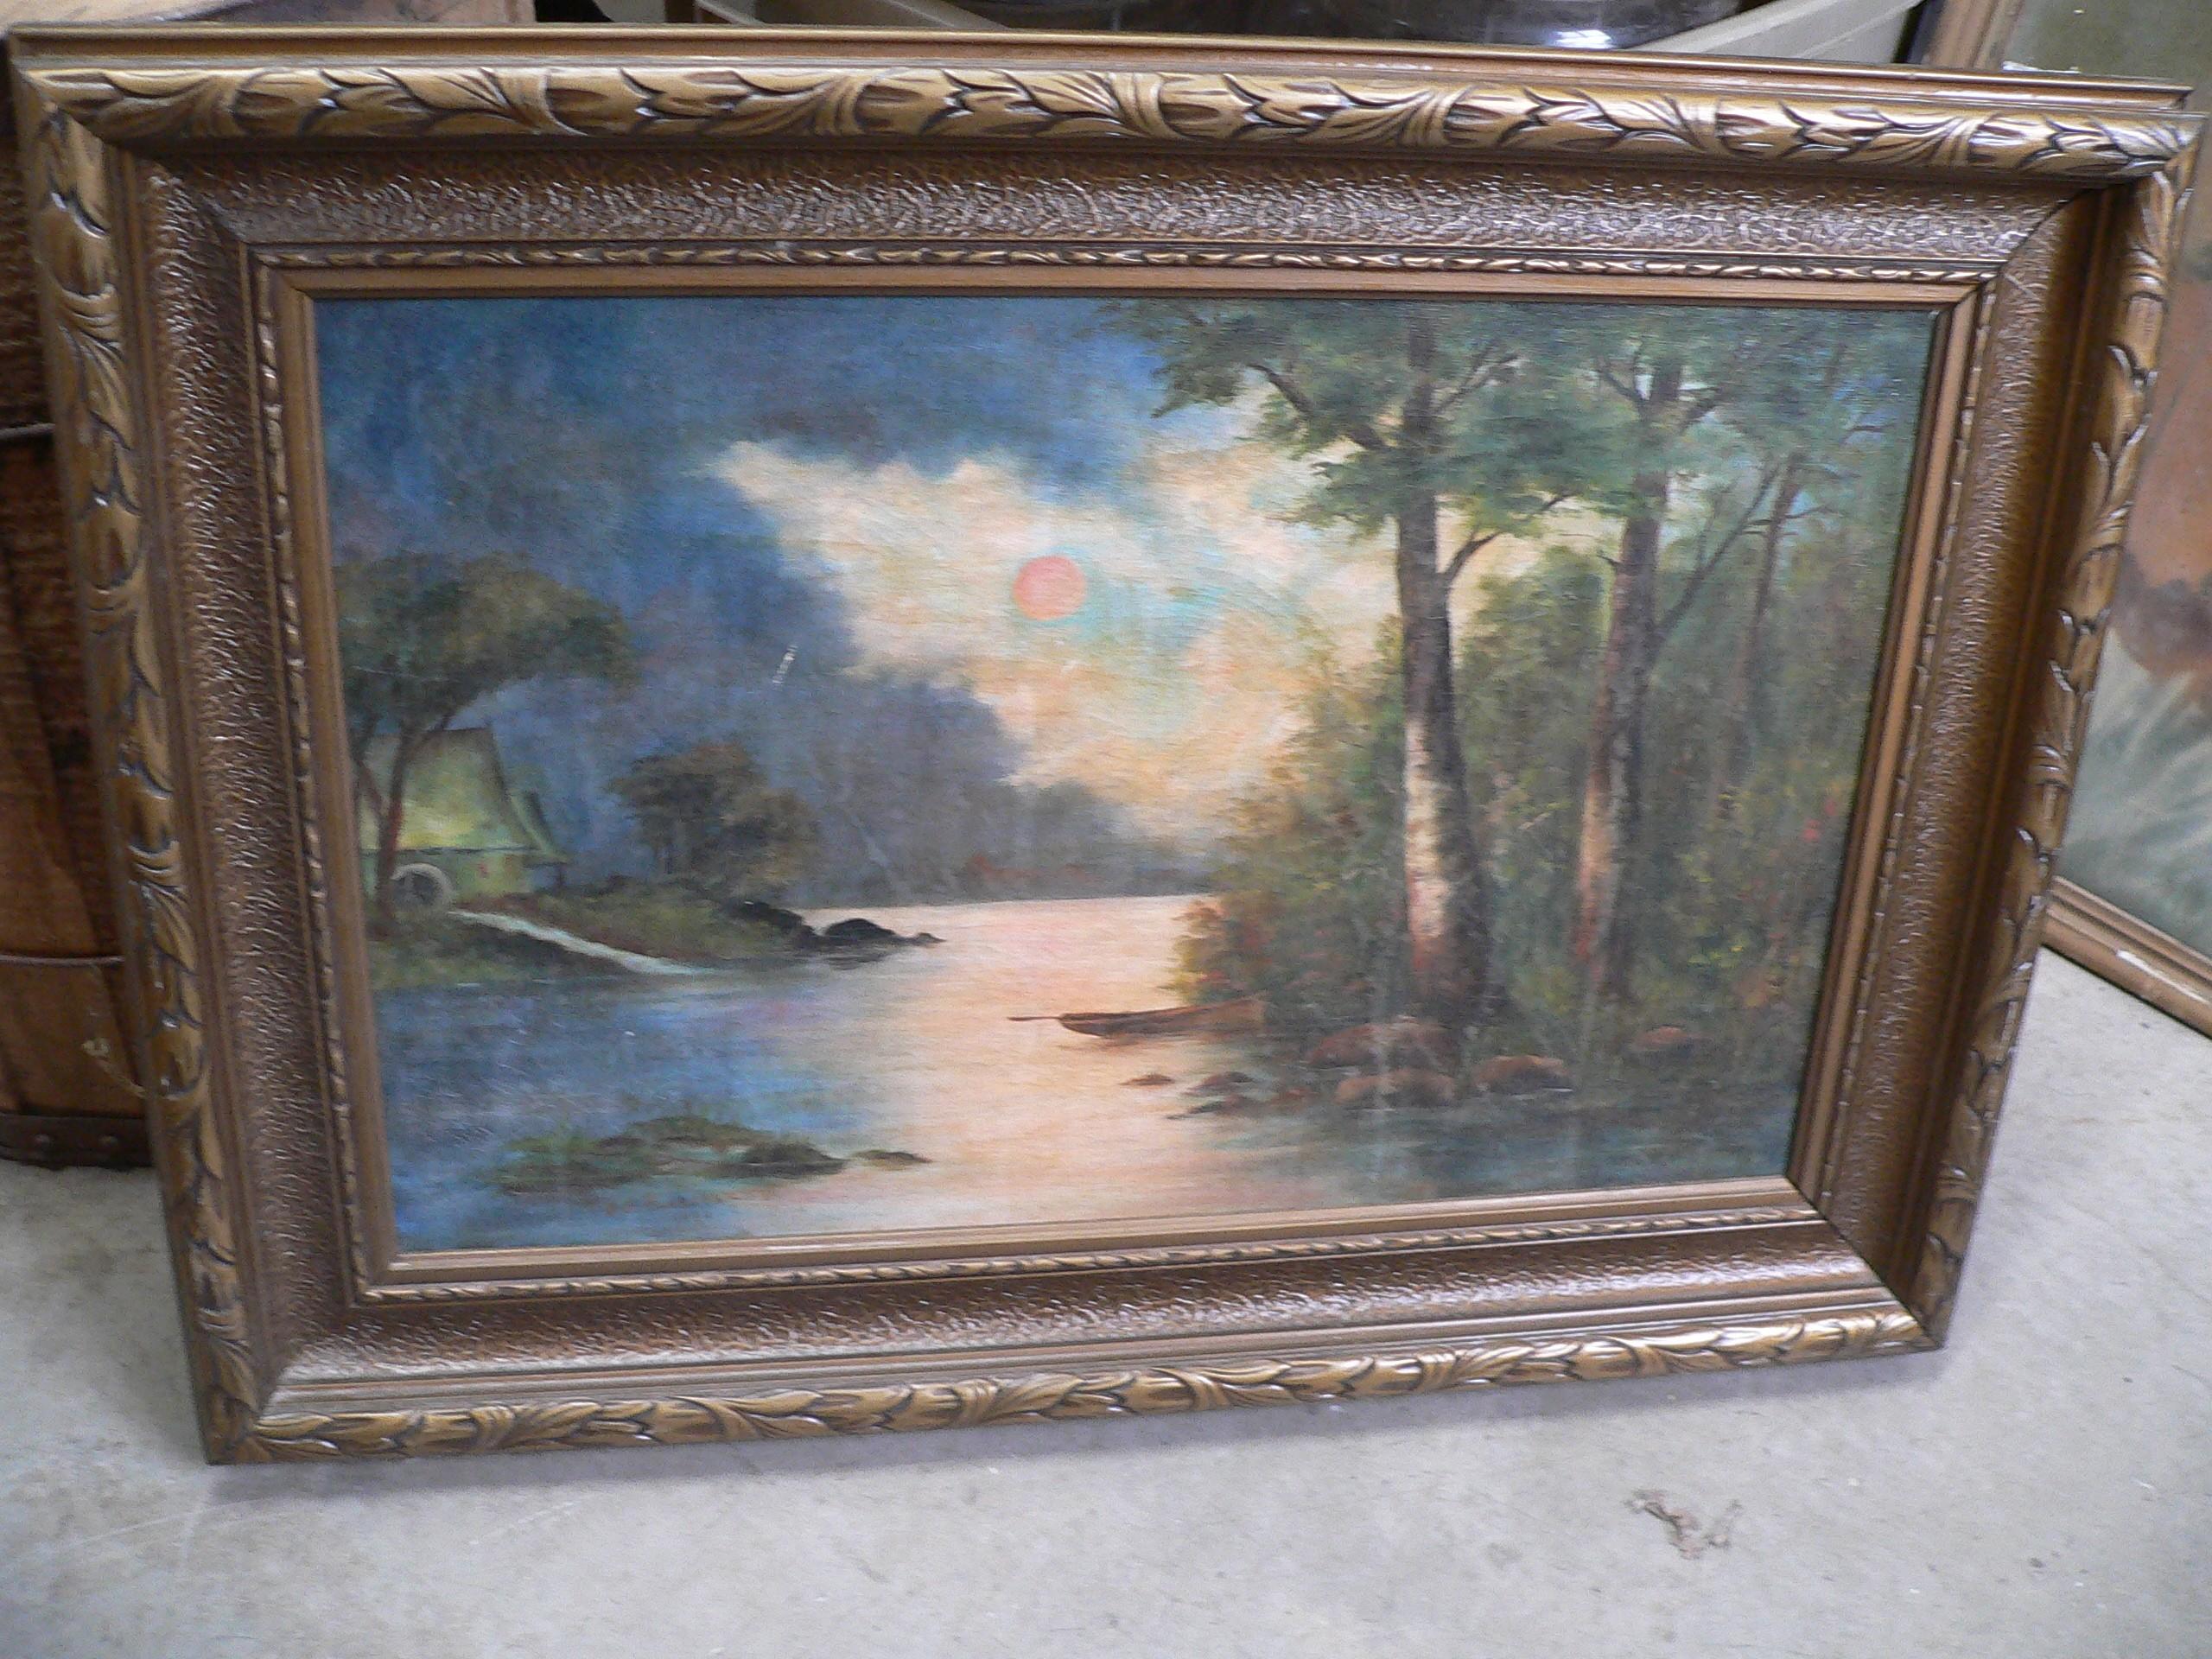 Peinture antique avec cadre # 7274.6